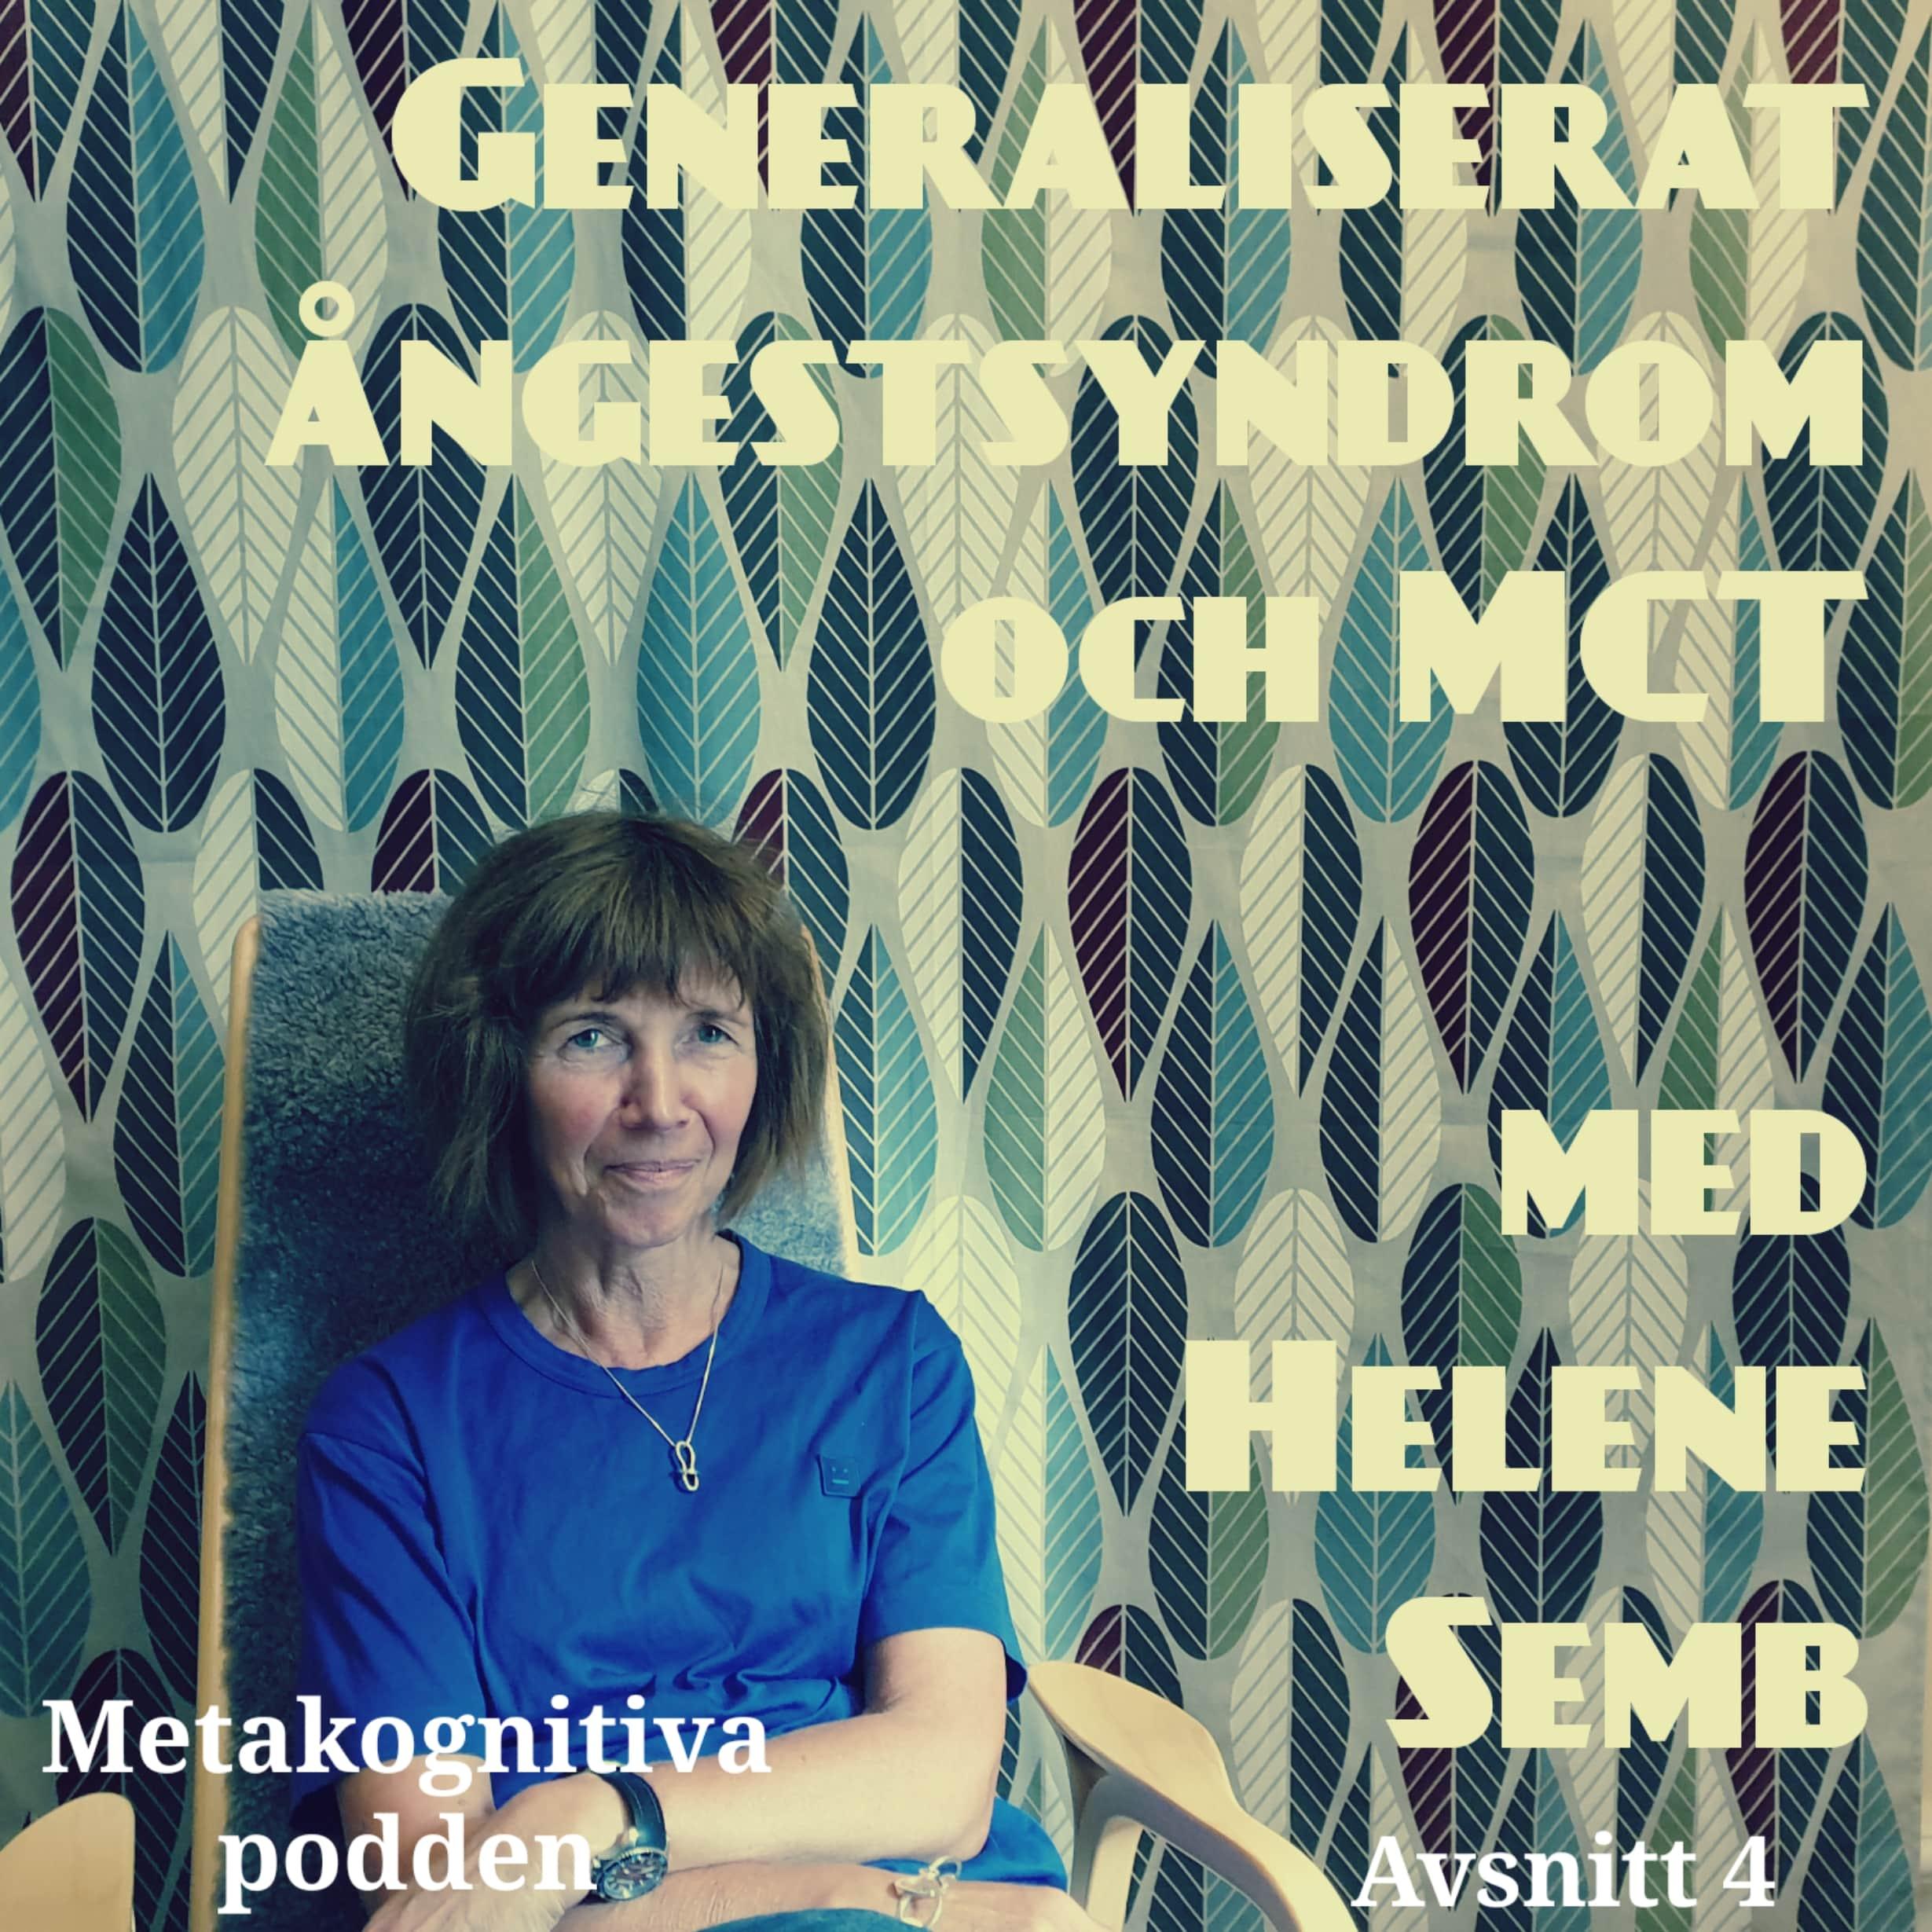 4. Generaliserat ångestsyndrom och MCT, med Helene Semb